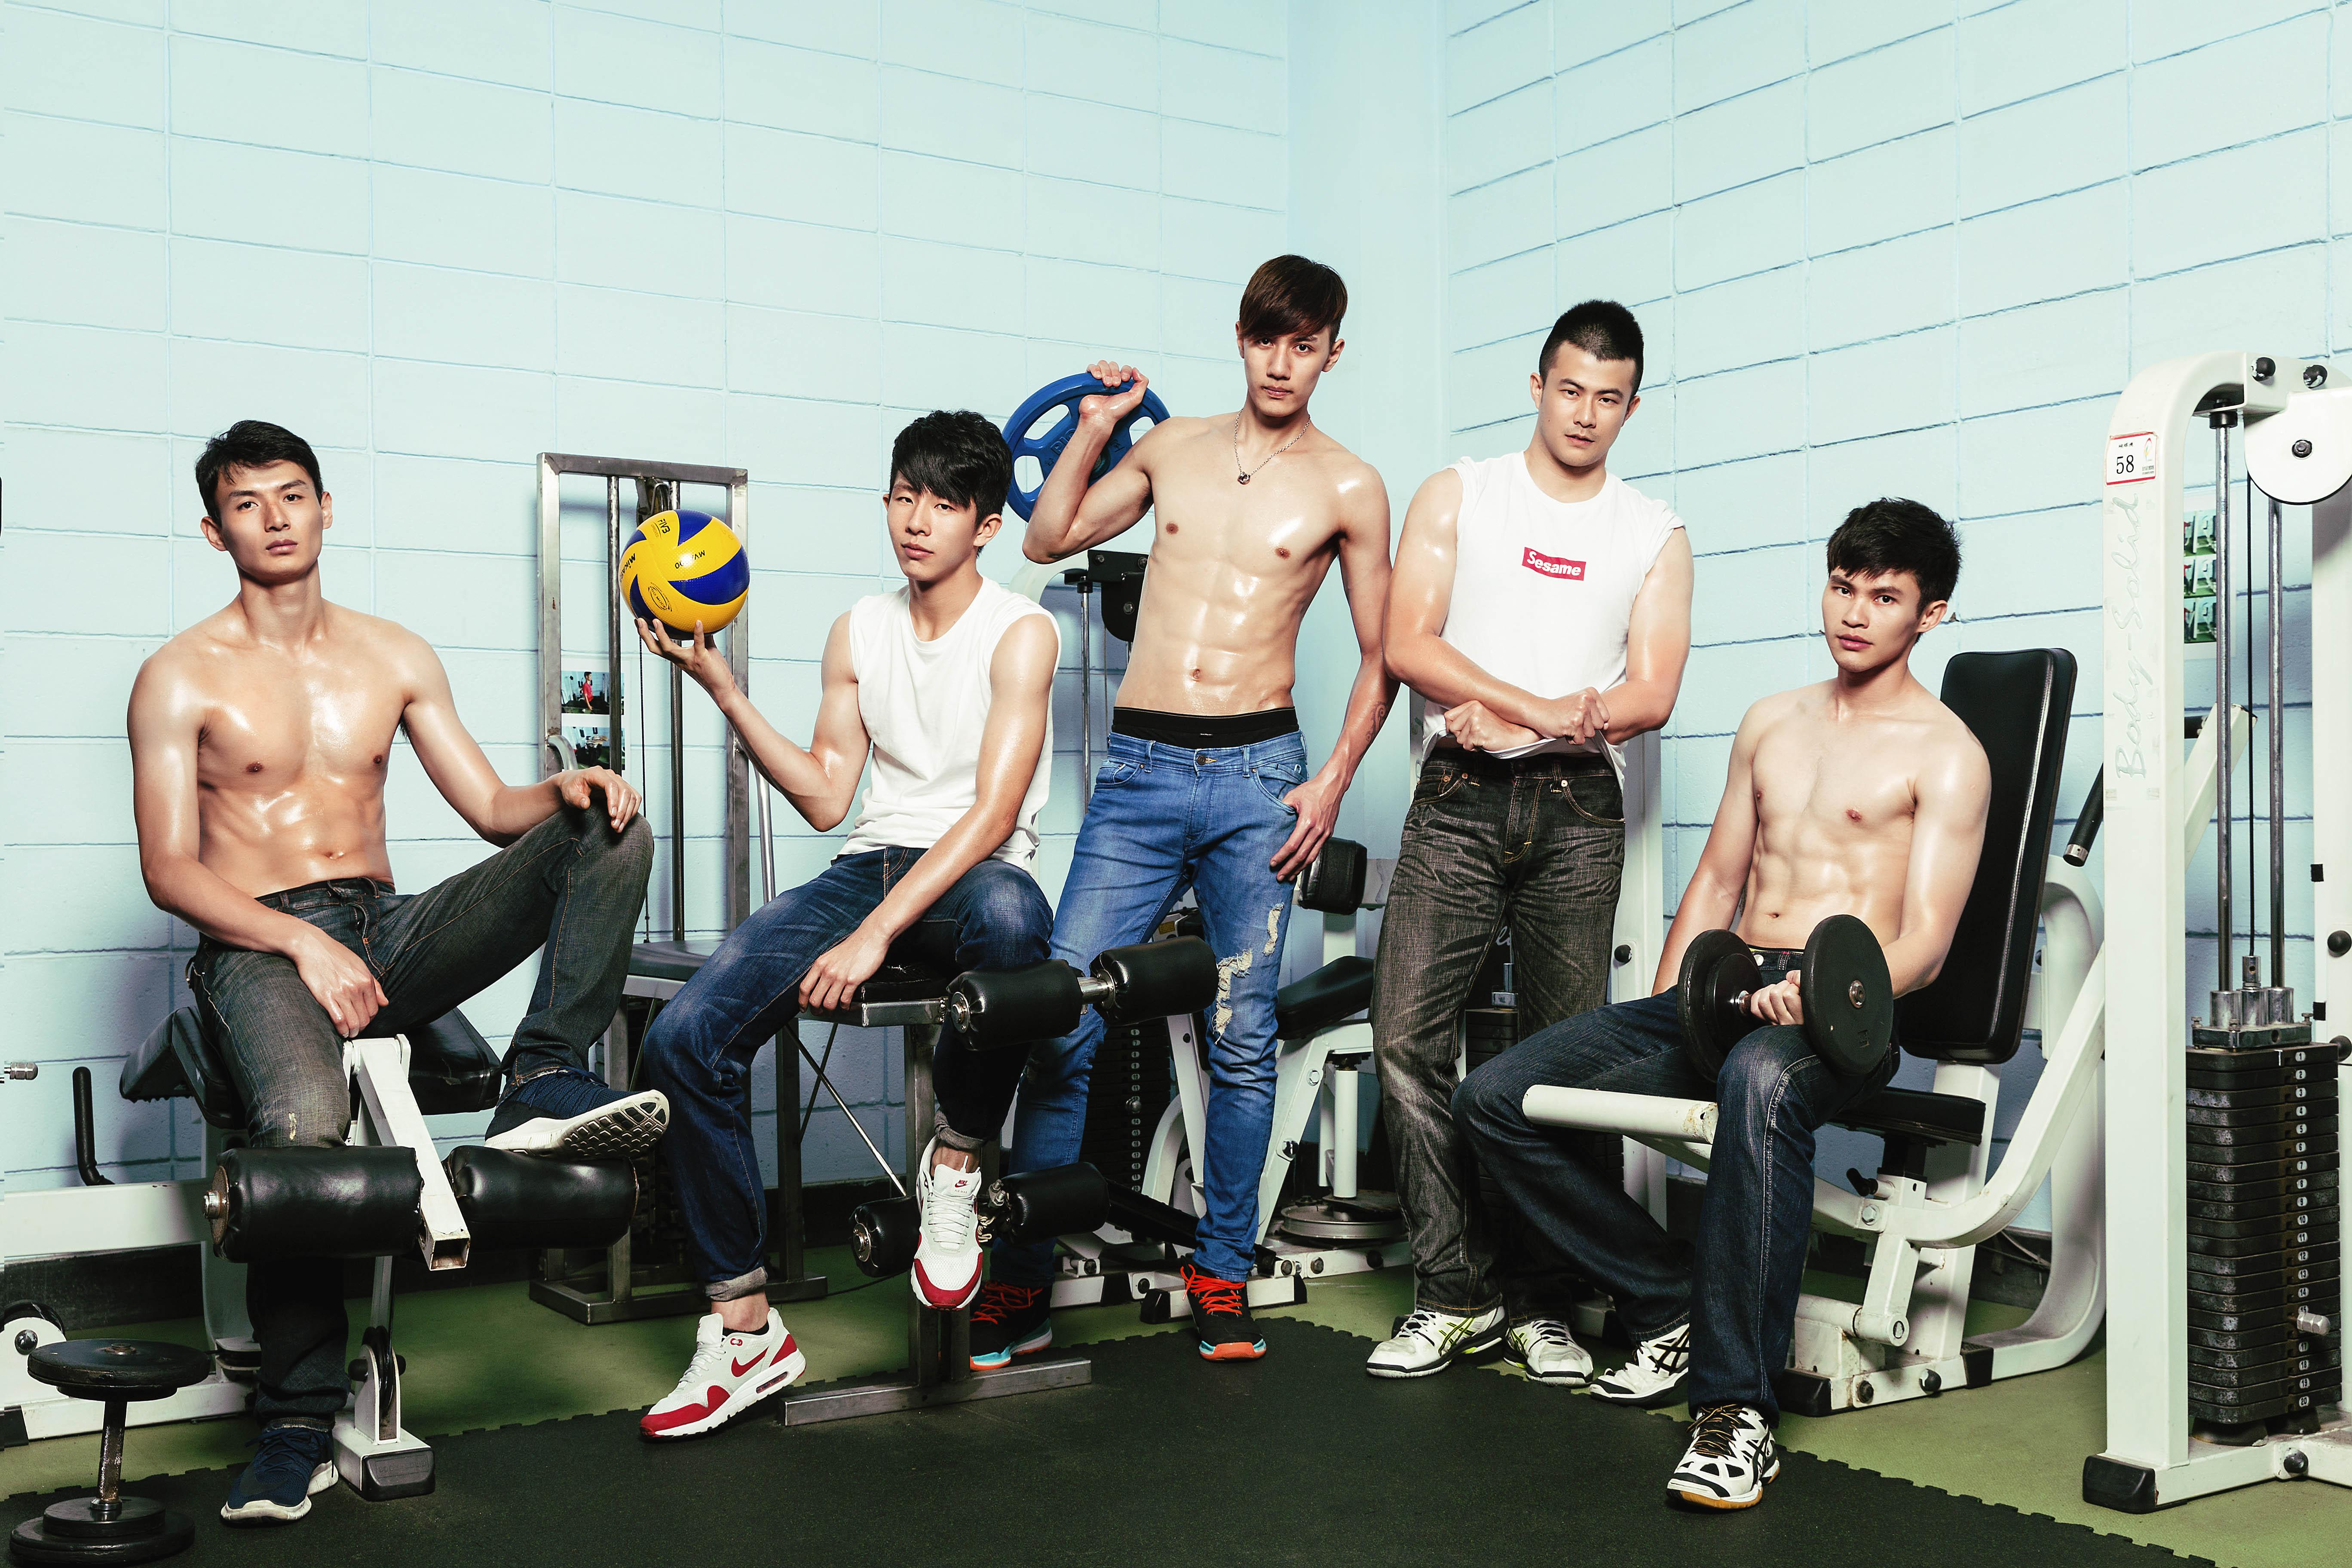 《 Hornet x 晏人物 》攝影師和那些台灣大學的排球男孩們